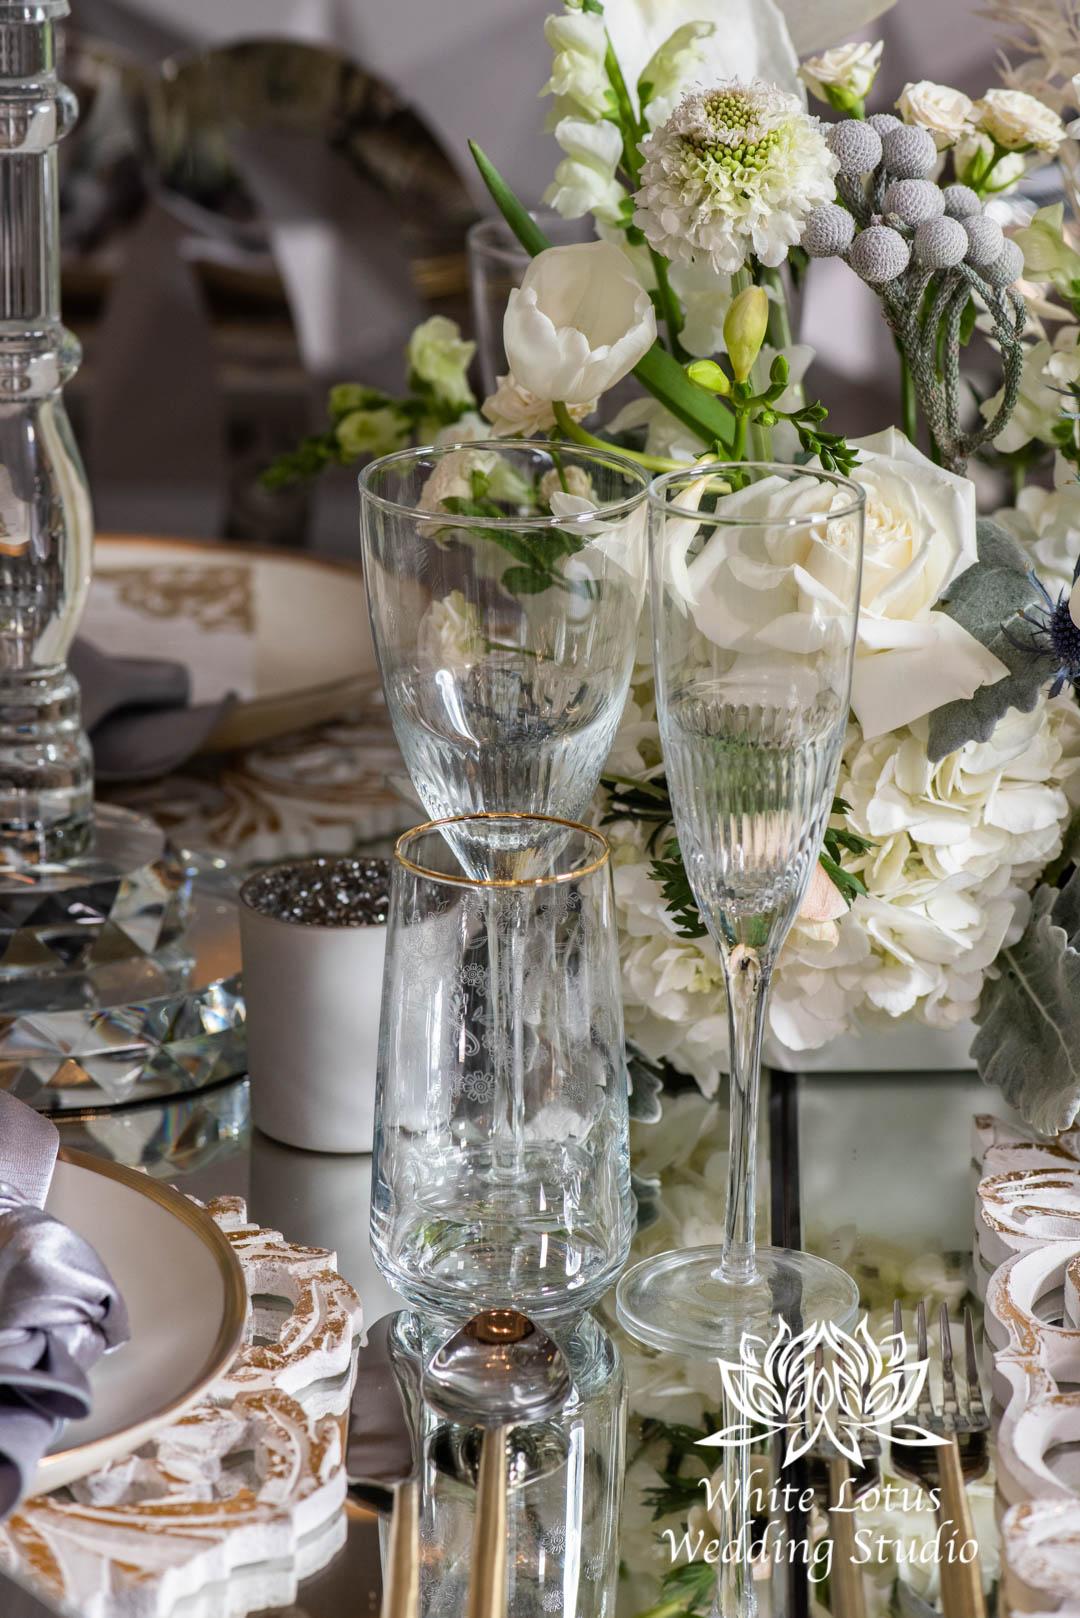 122- GLAM WINTERLUXE WEDDING INSPIRATION